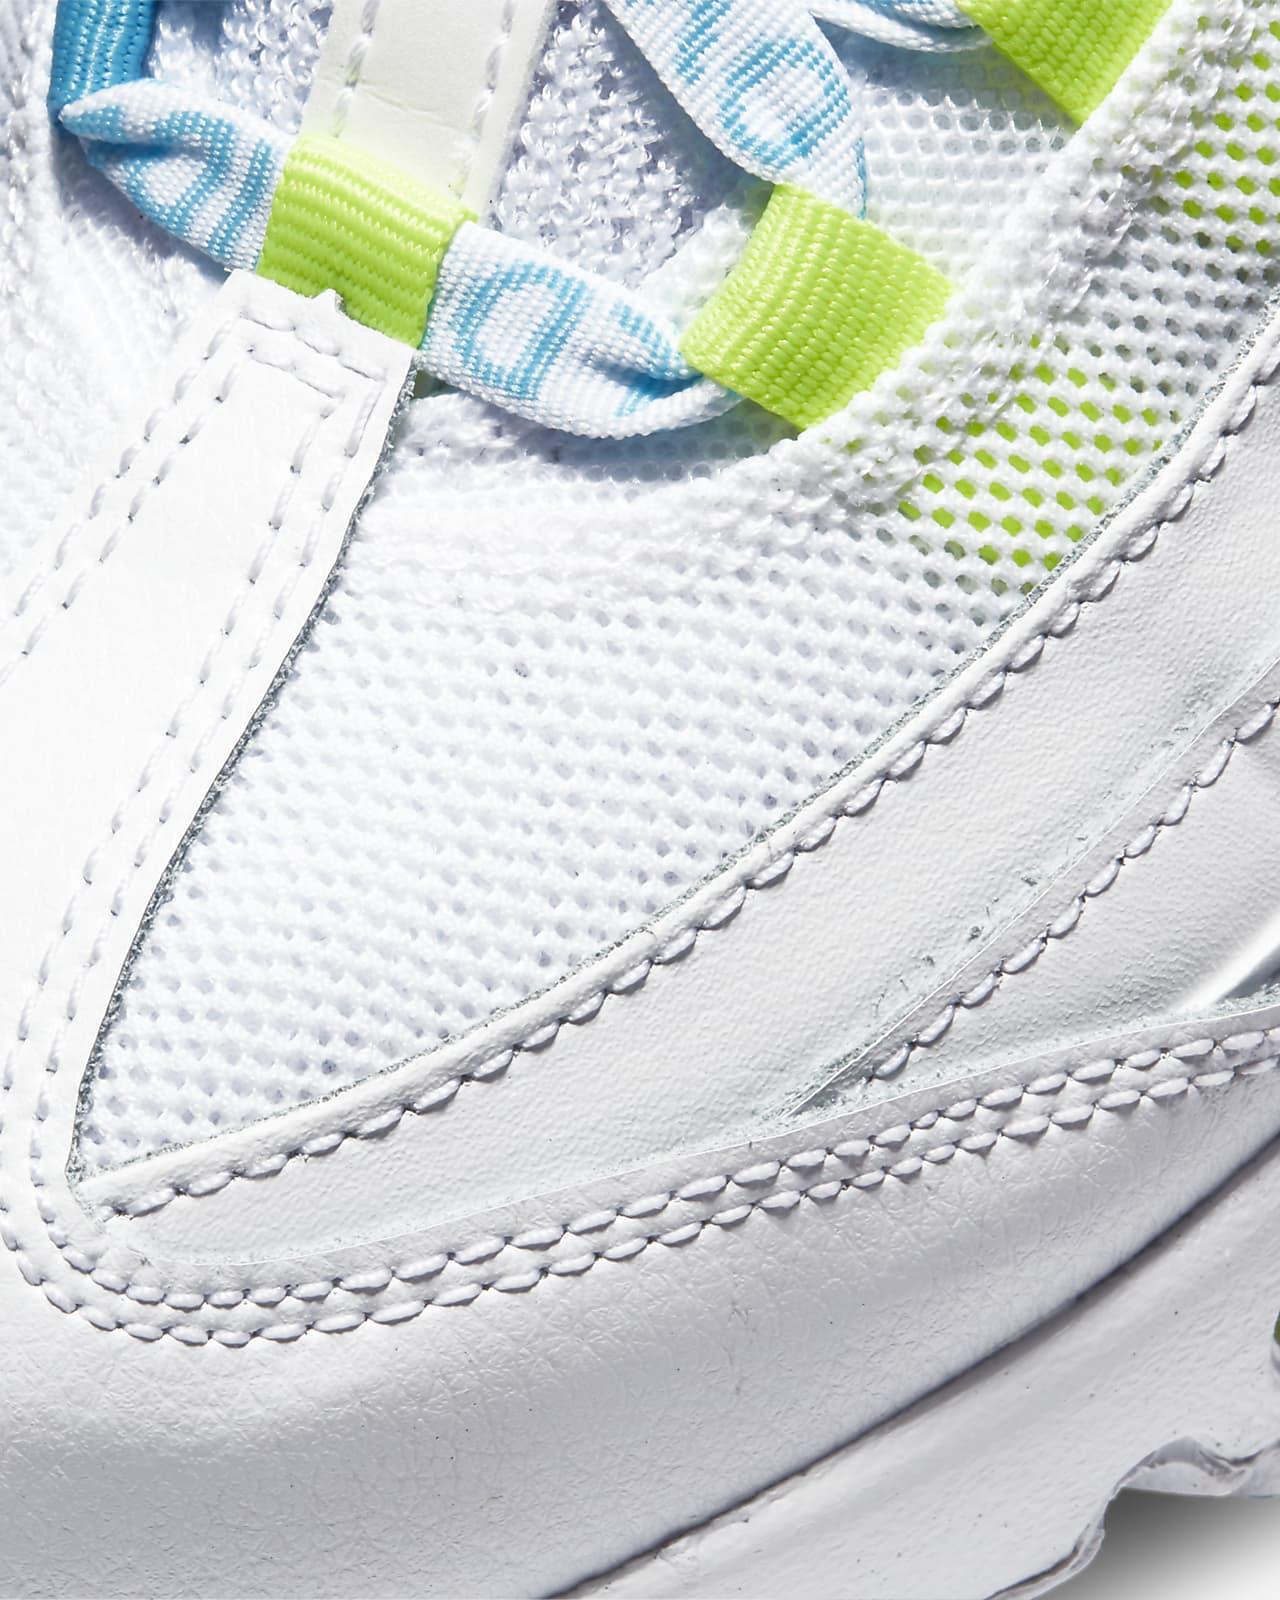 Chaussure Nike Air Max 95 SE pour Femme